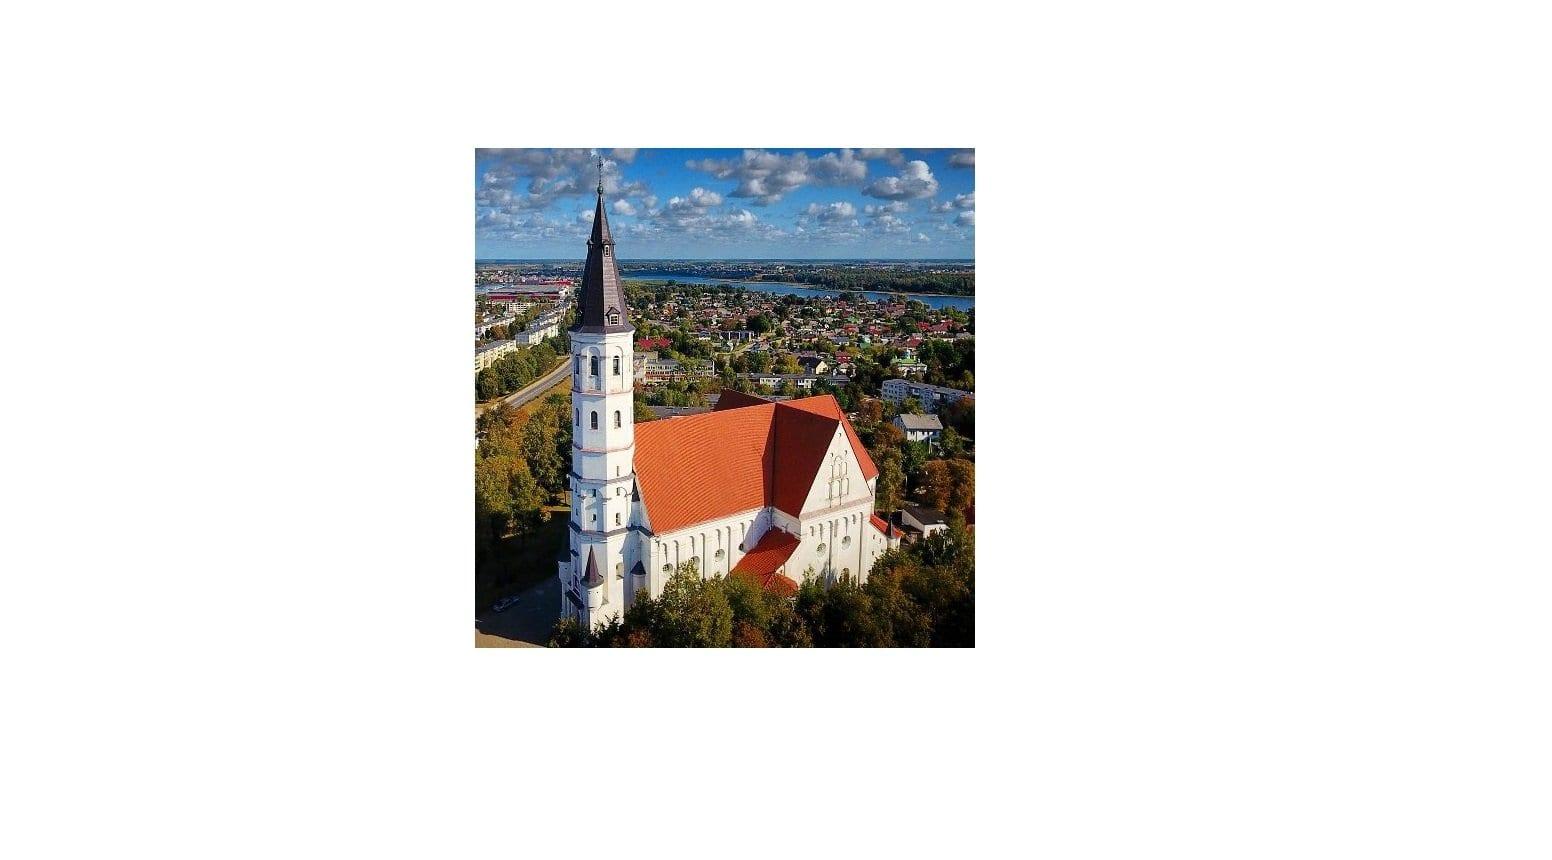 Šiauliu bažnyčia